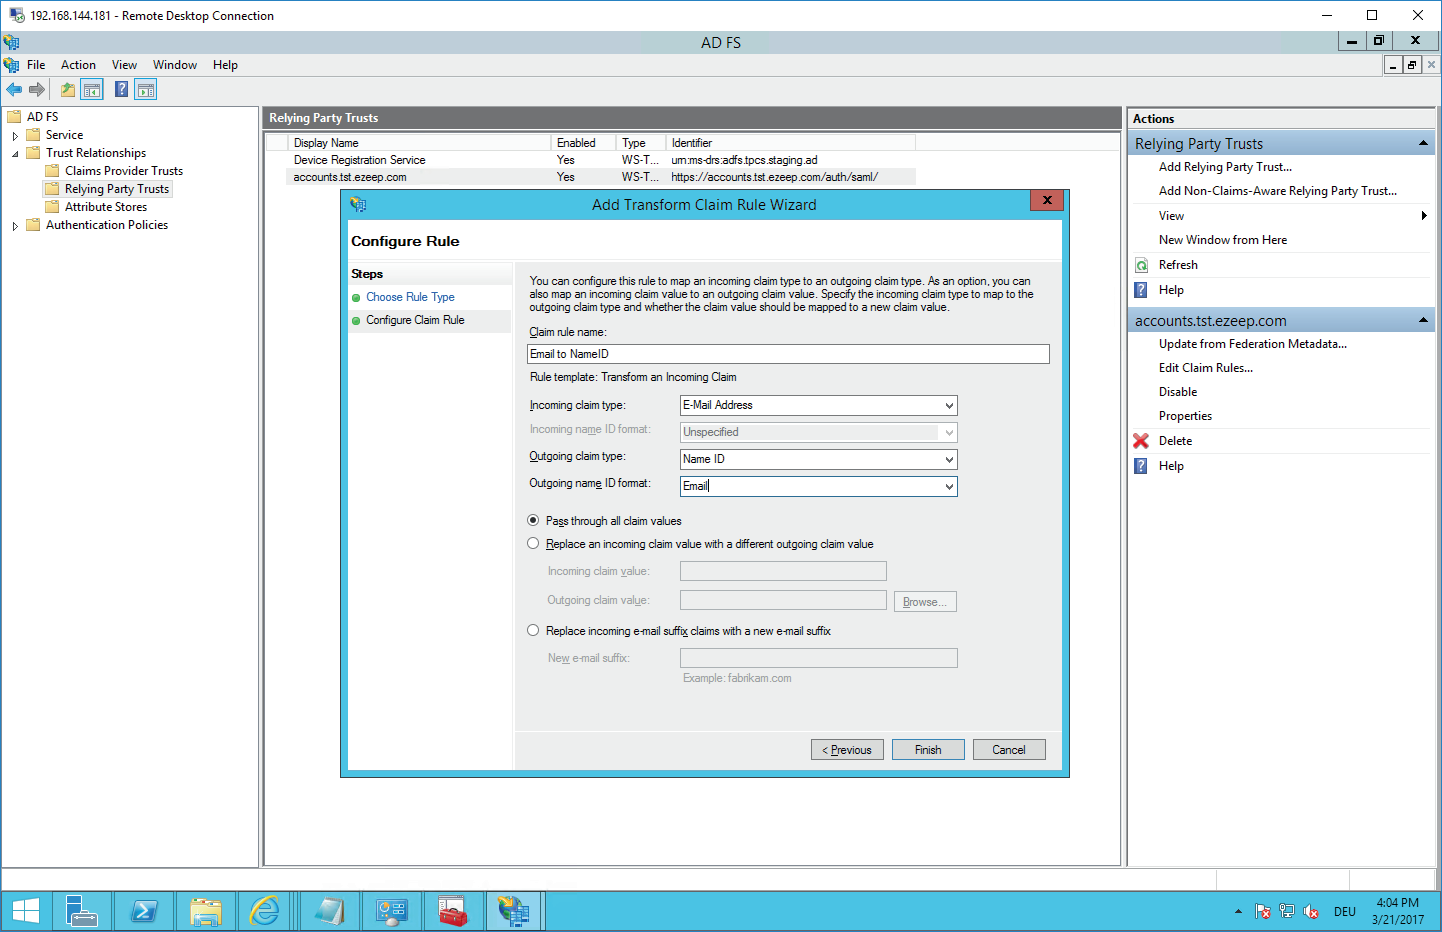 screenshot: configure transform claim rule